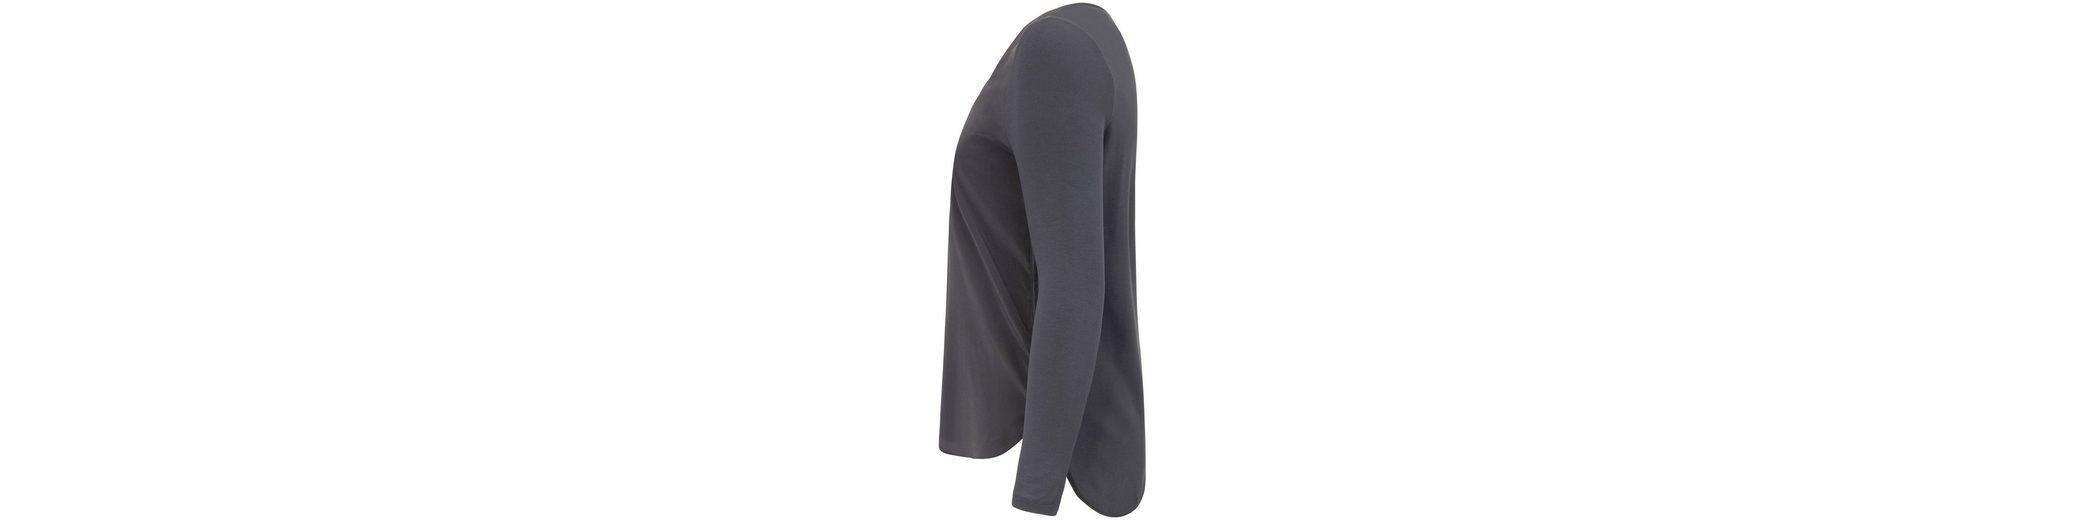 Emilia Lay Klassische Bluse aus Seide, Kellerfalte